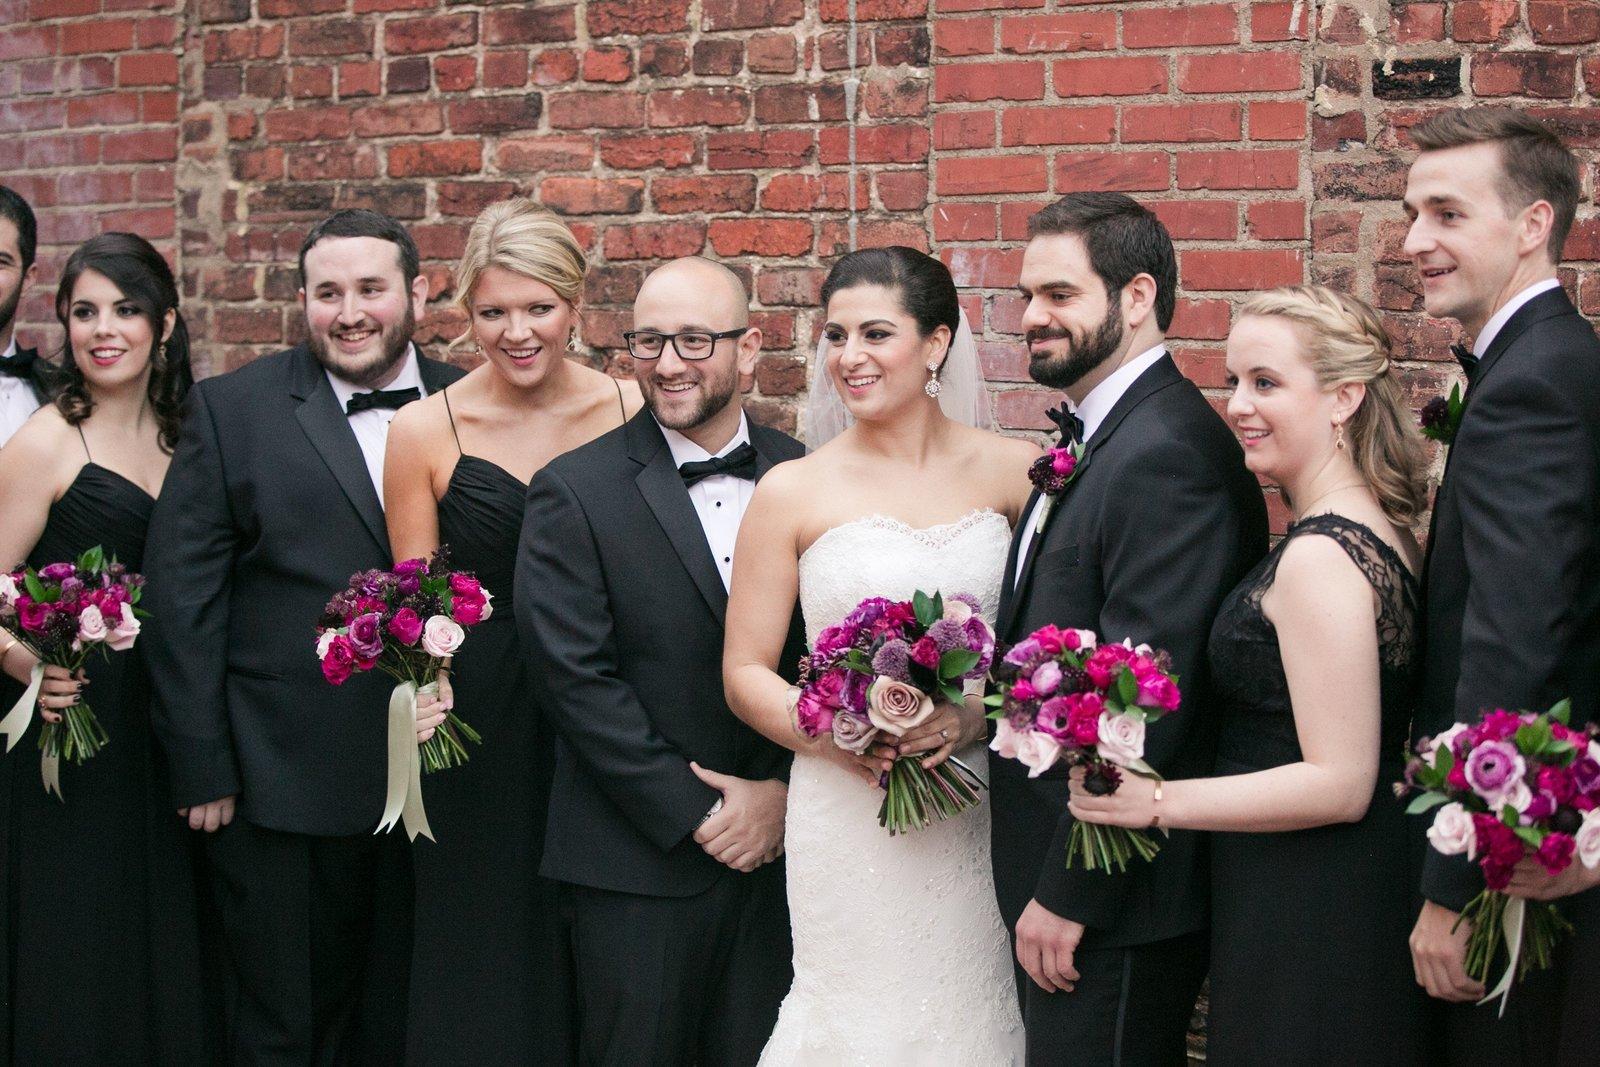 Black-tie-wedding-photos-longview-gallery-dc (166)